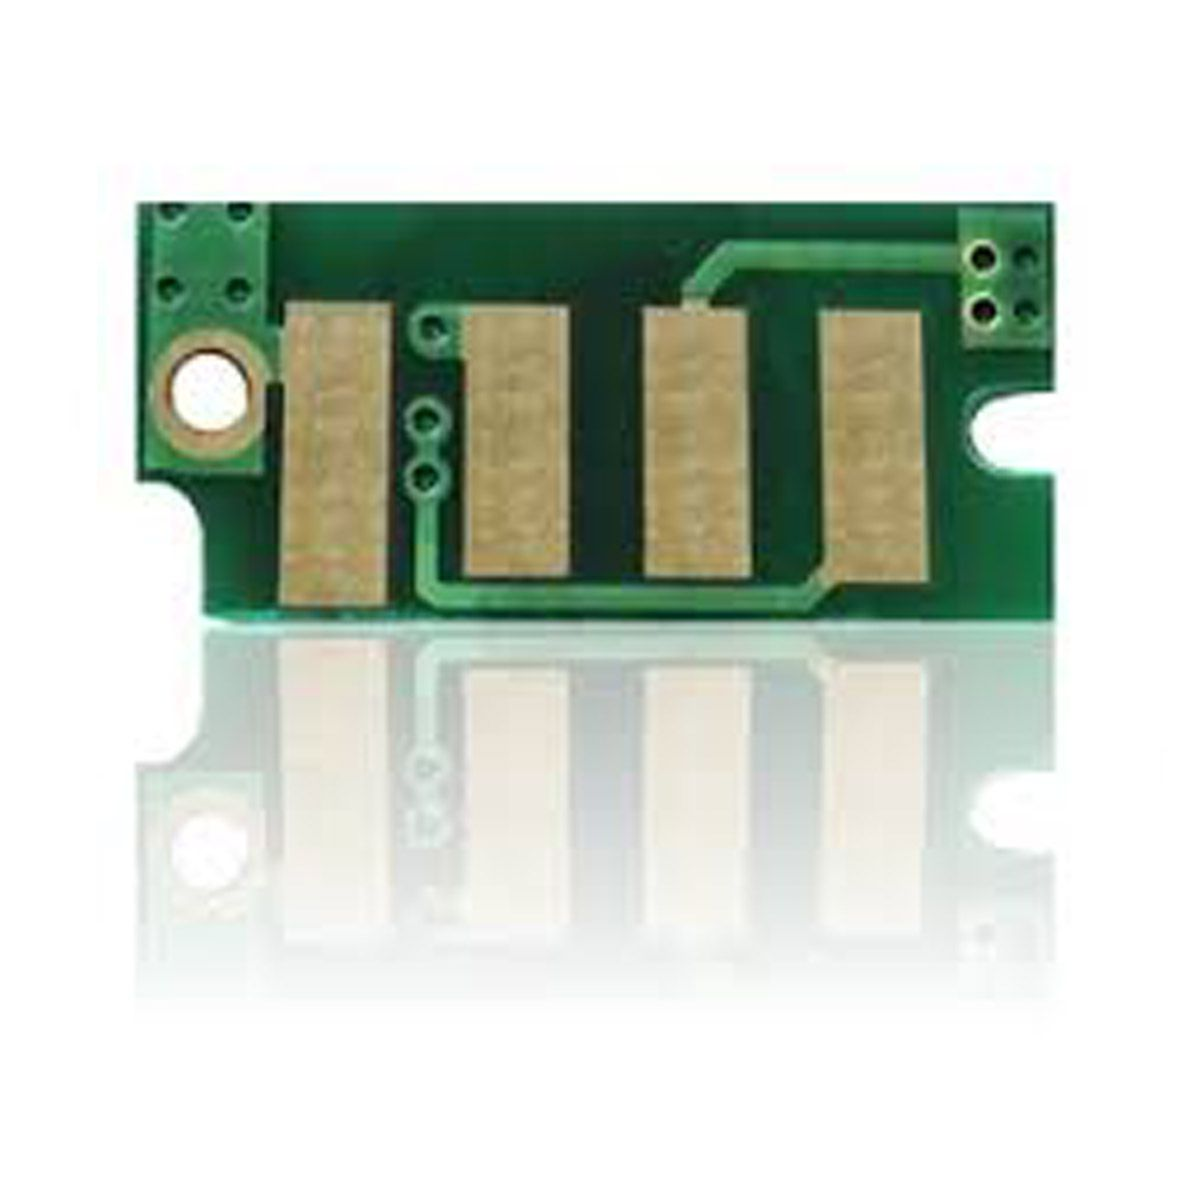 Chip Xerox Phaser 3045 3040 3010 - 106R02180   106R02182 - 2K